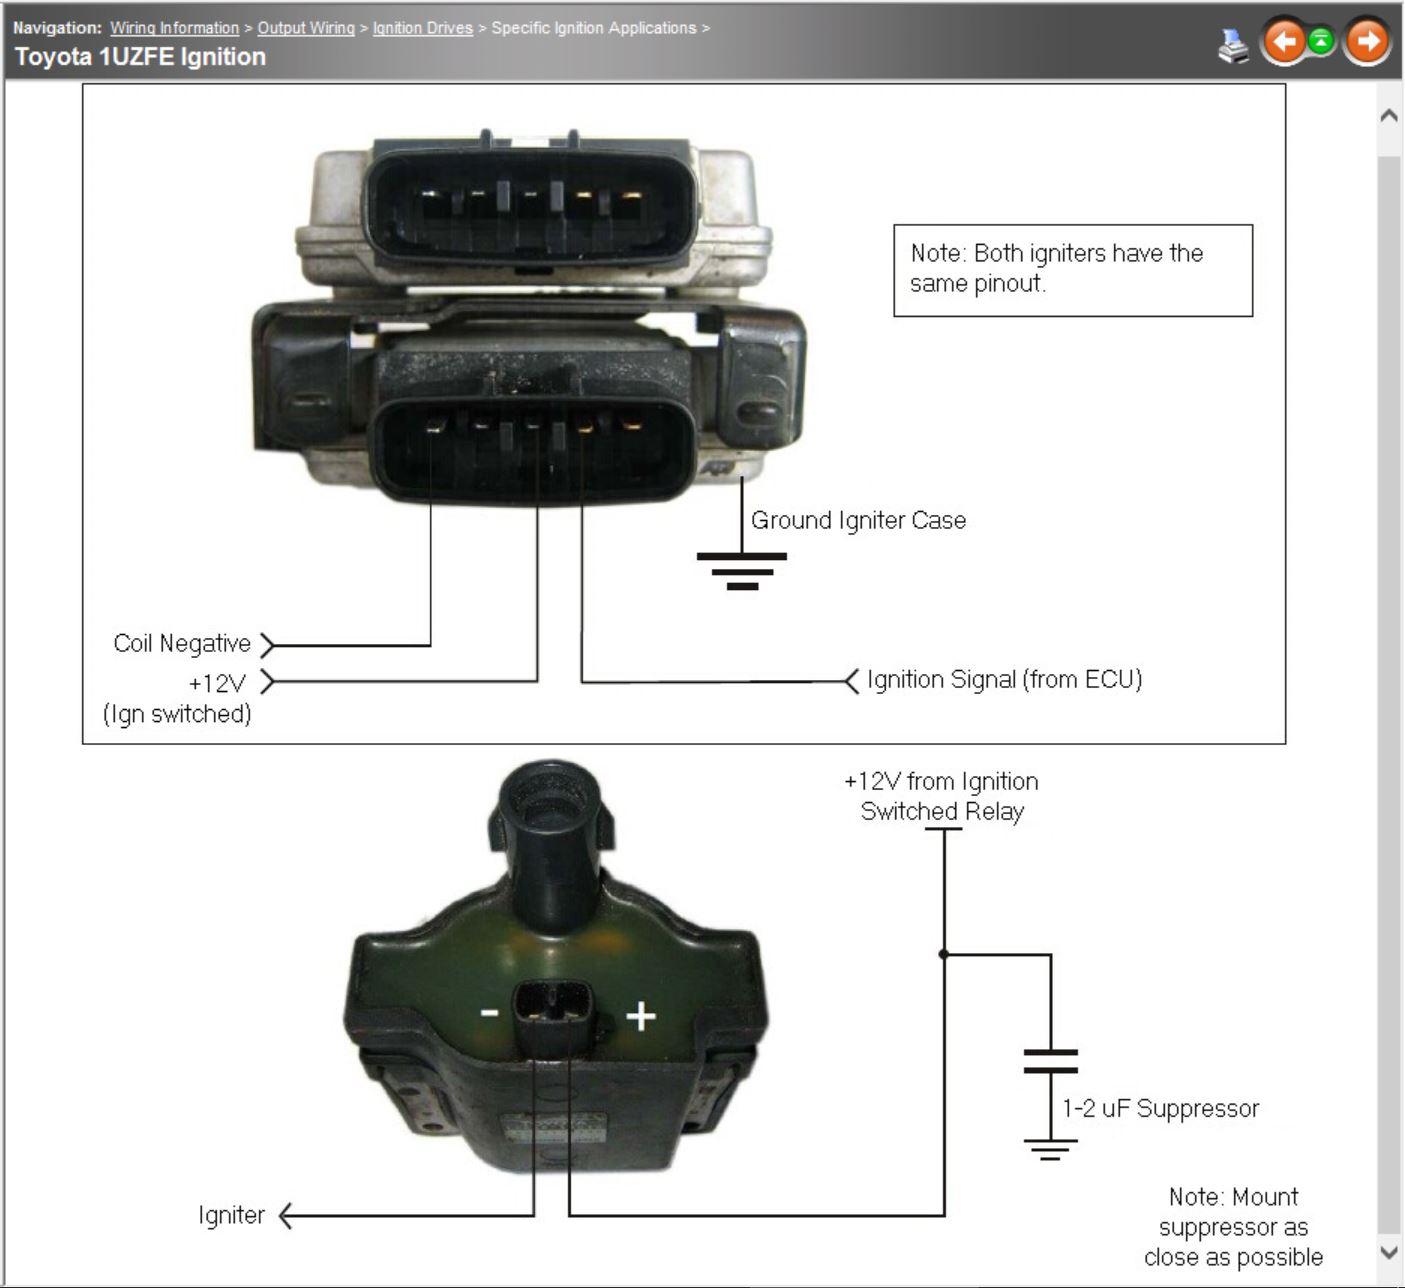 Lexus 1uzfe Help Link G4 Link Engine Management